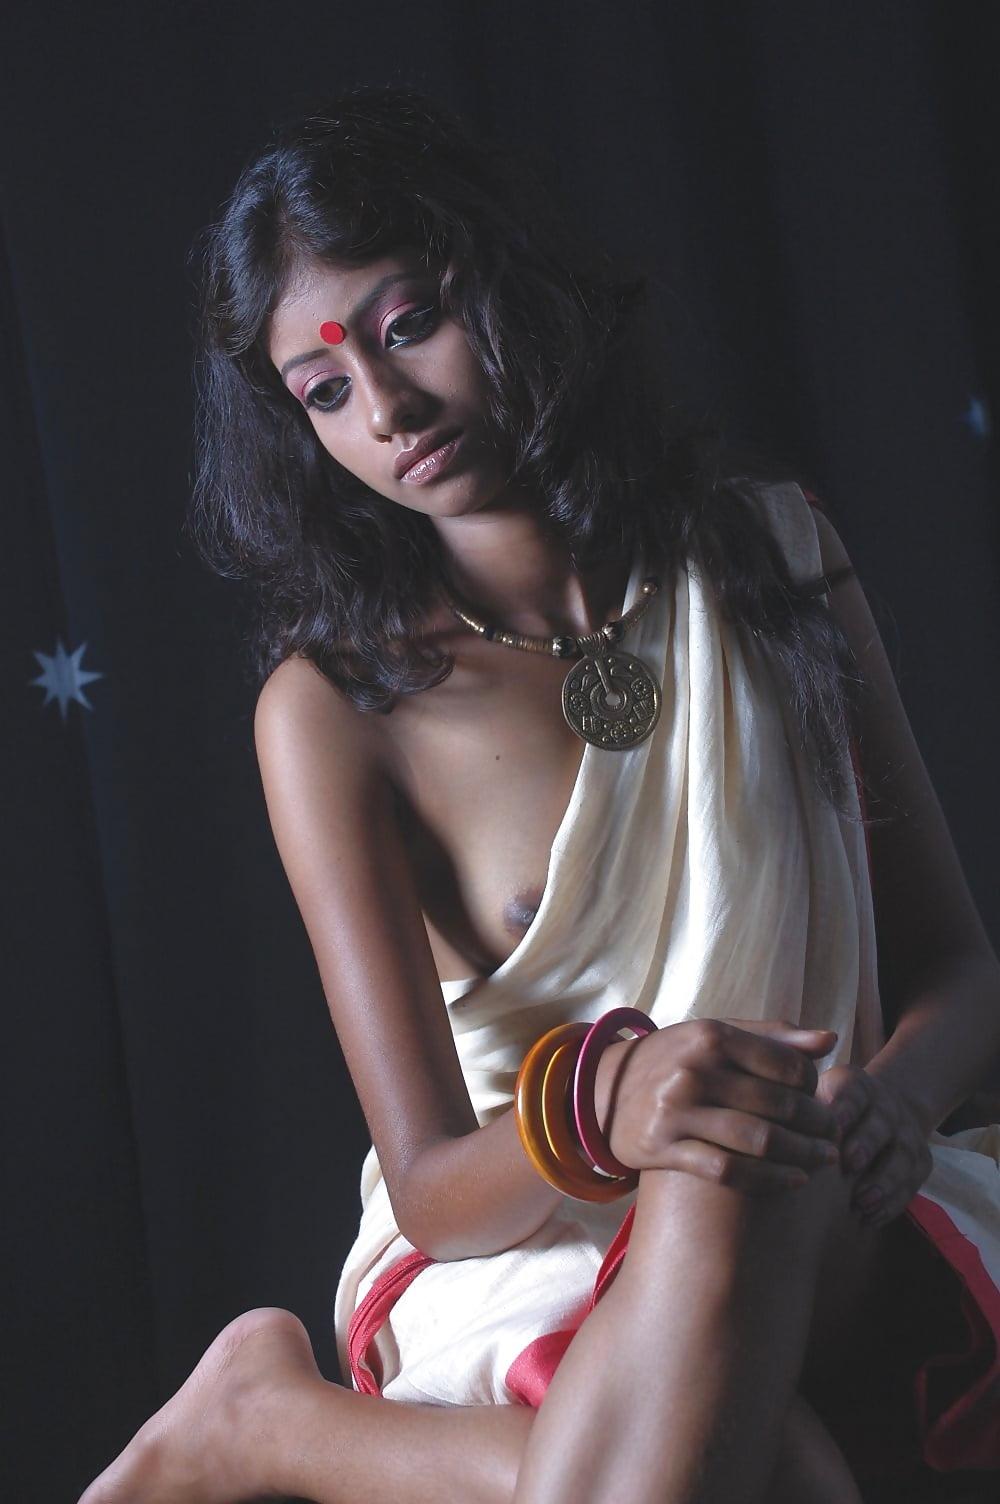 Naked photo bengali girl hd porn pics